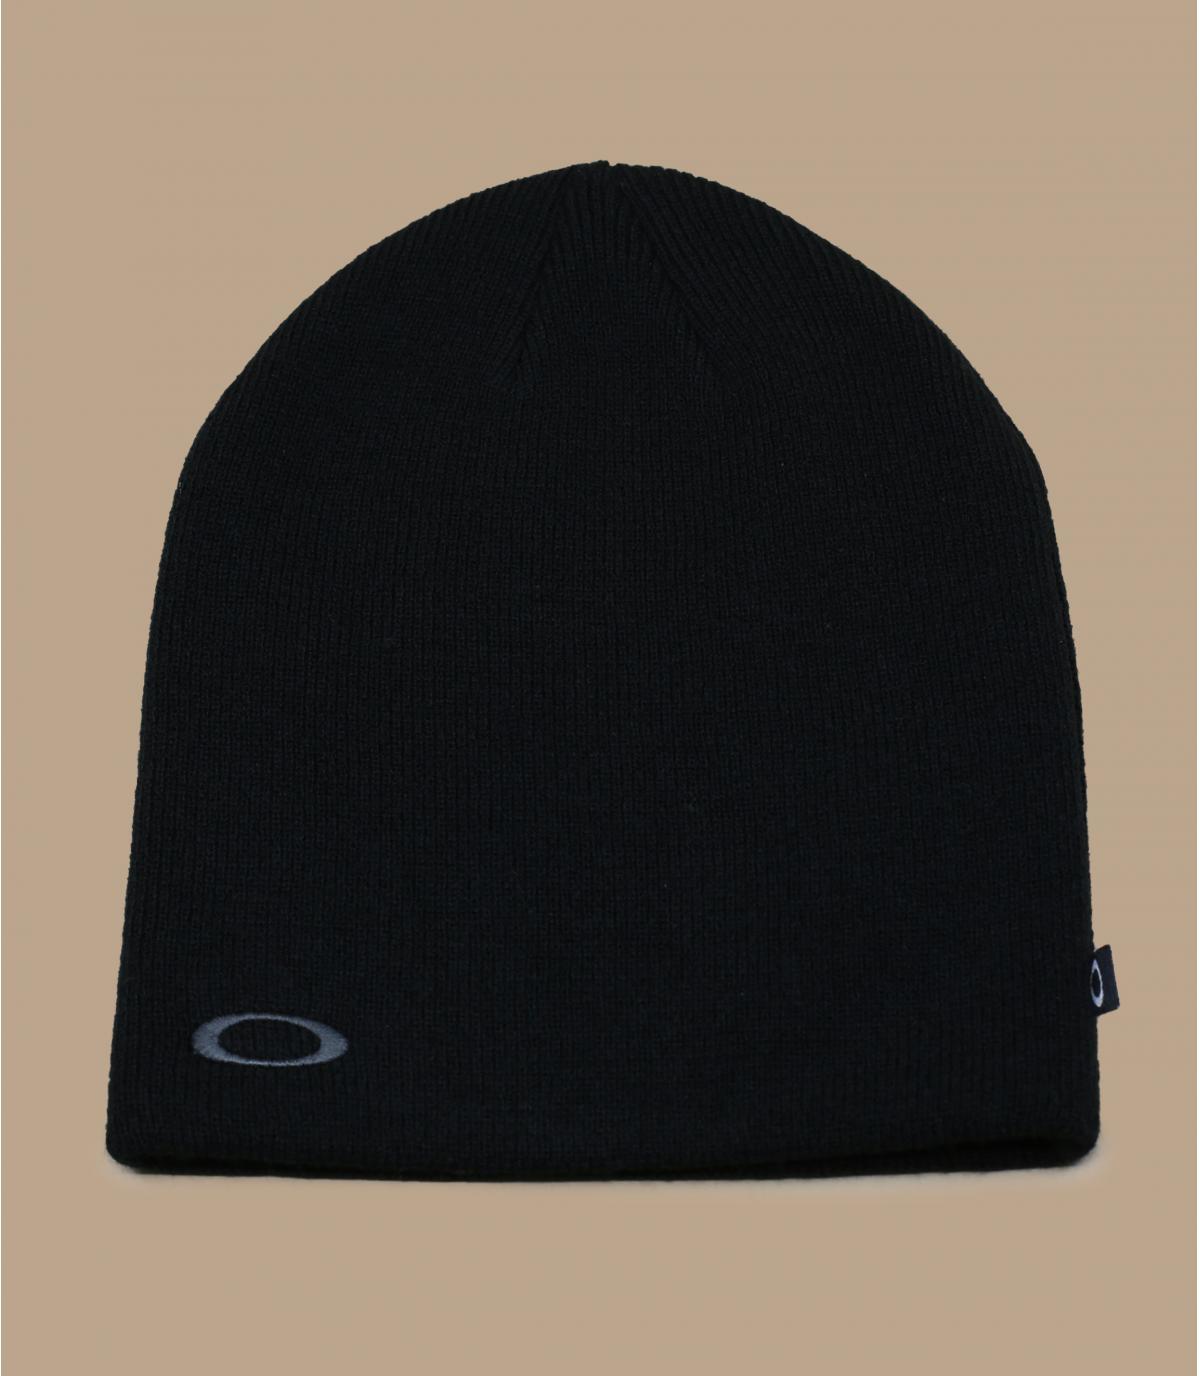 Mütze Oakley schwarz